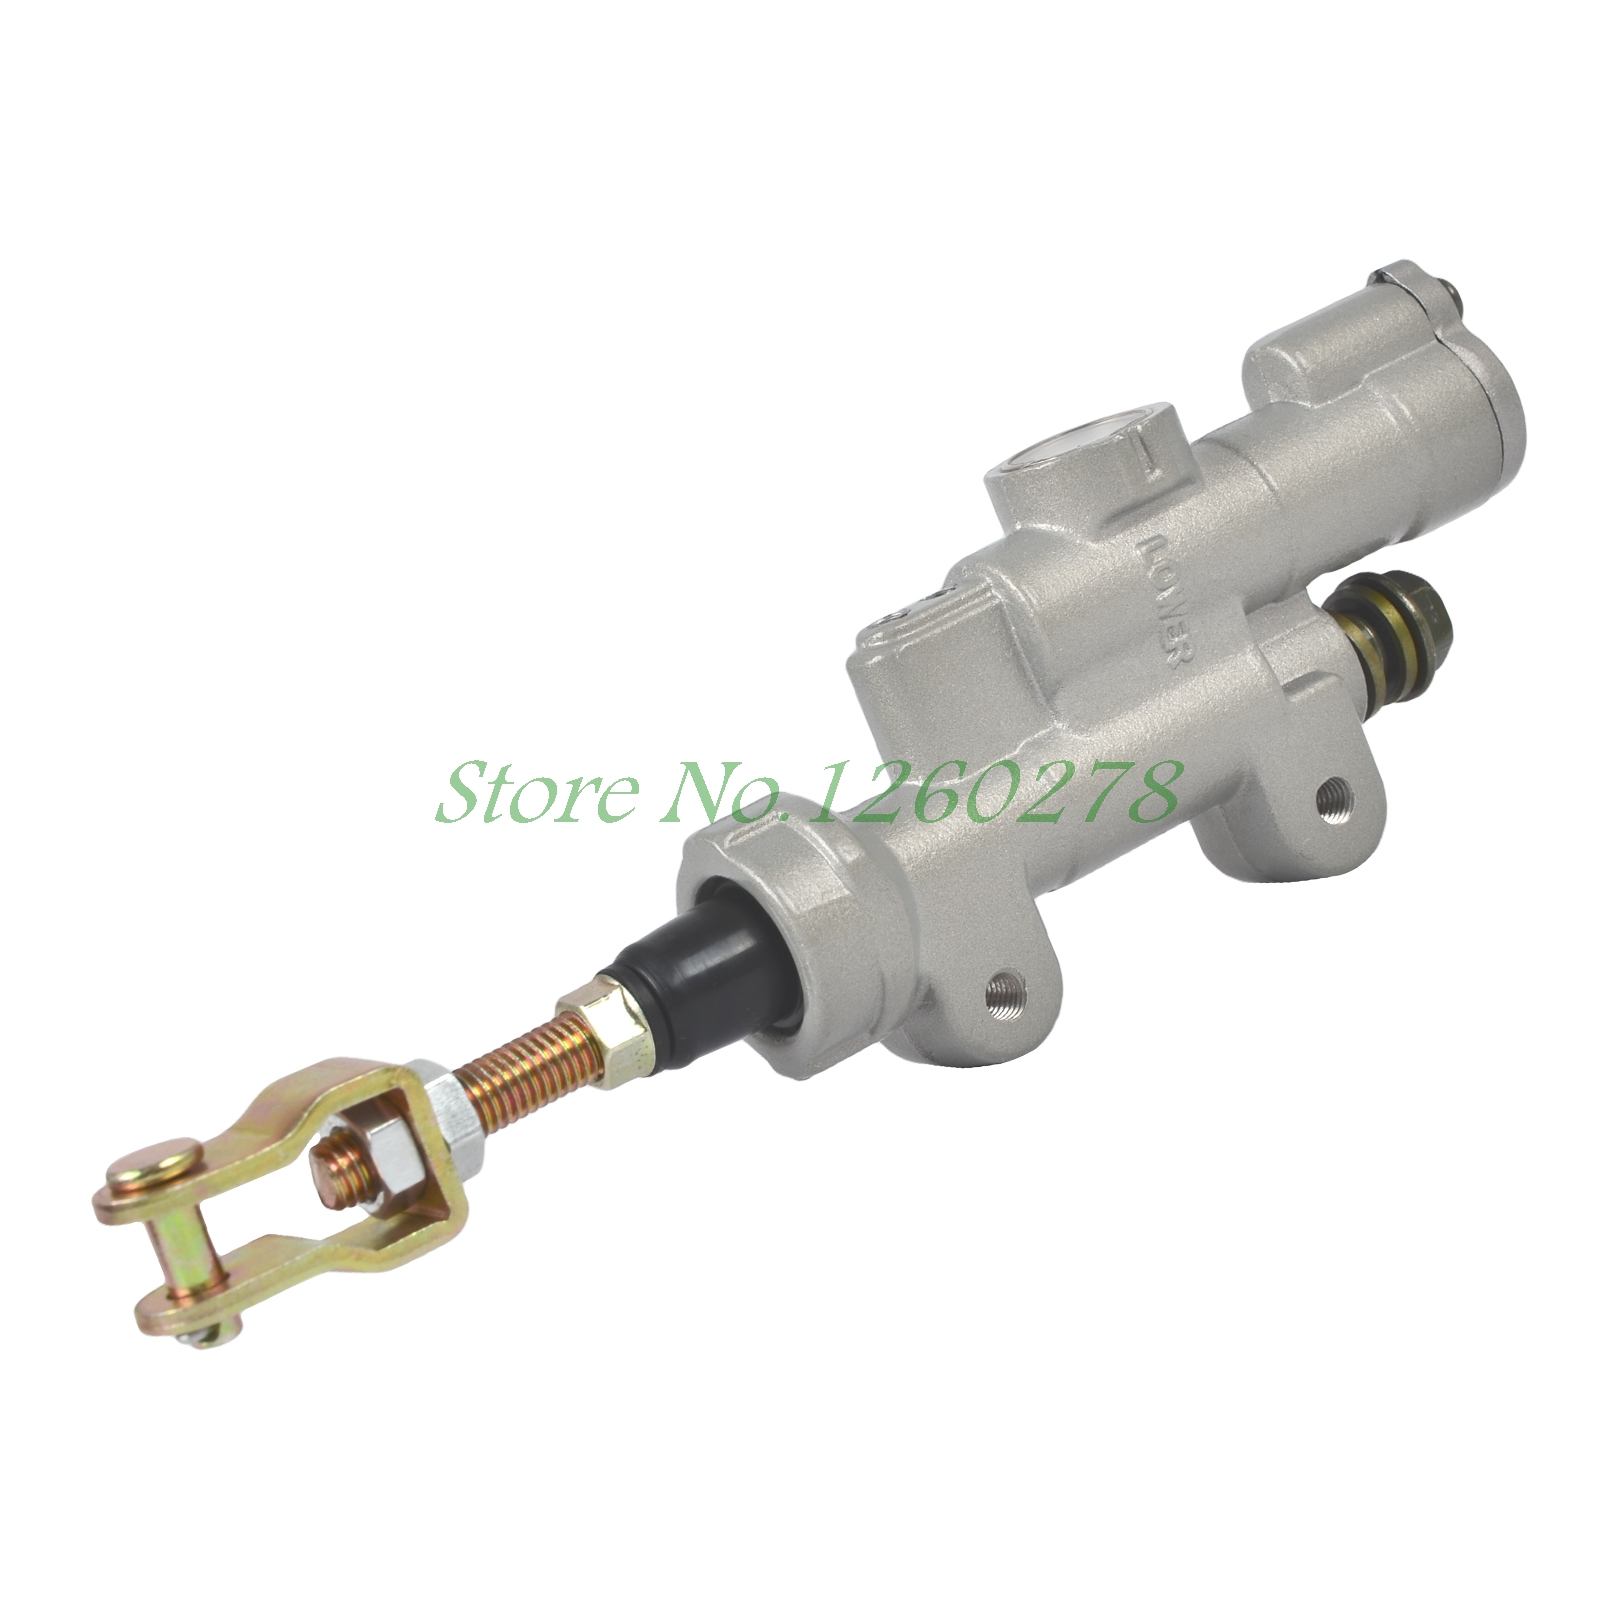 Rear Brake Master Cylinder For HONDA CRF450R 2002-2015 CRF 450R NEW fp75r12kt4 fp75r12kt4 b15 fp100r12kt4 fp75r12kt3 spot quality